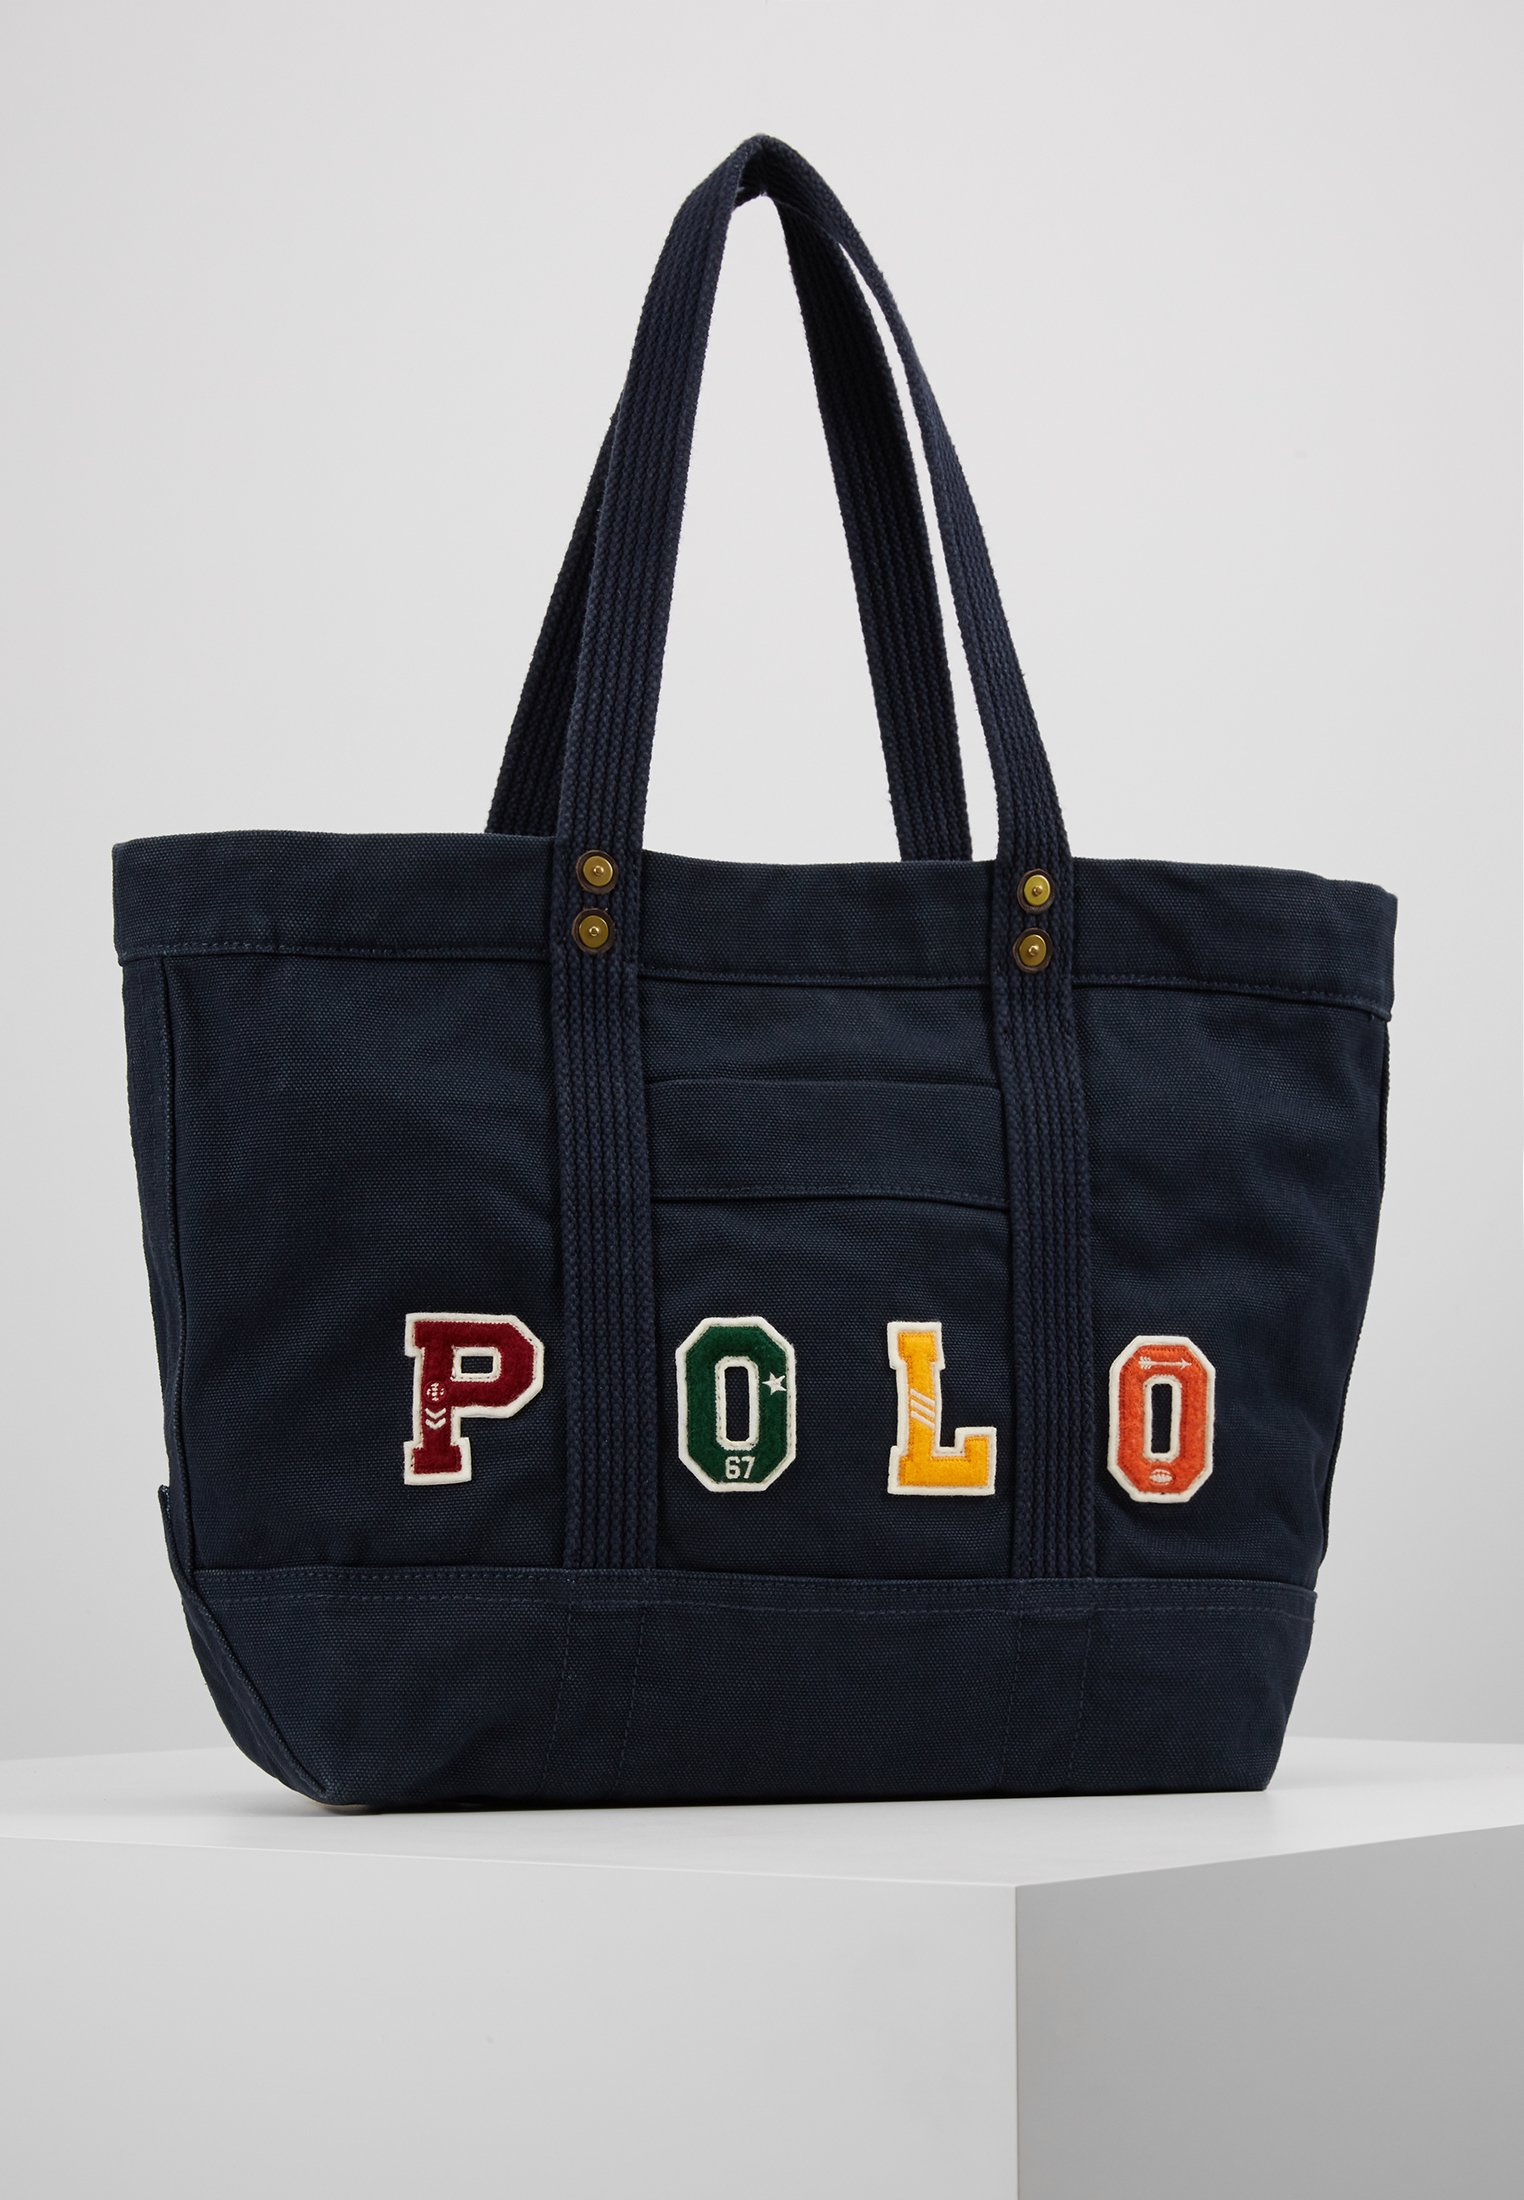 Bag Polo ToteShopping Navy Lauren Ralph nwO8XPk0